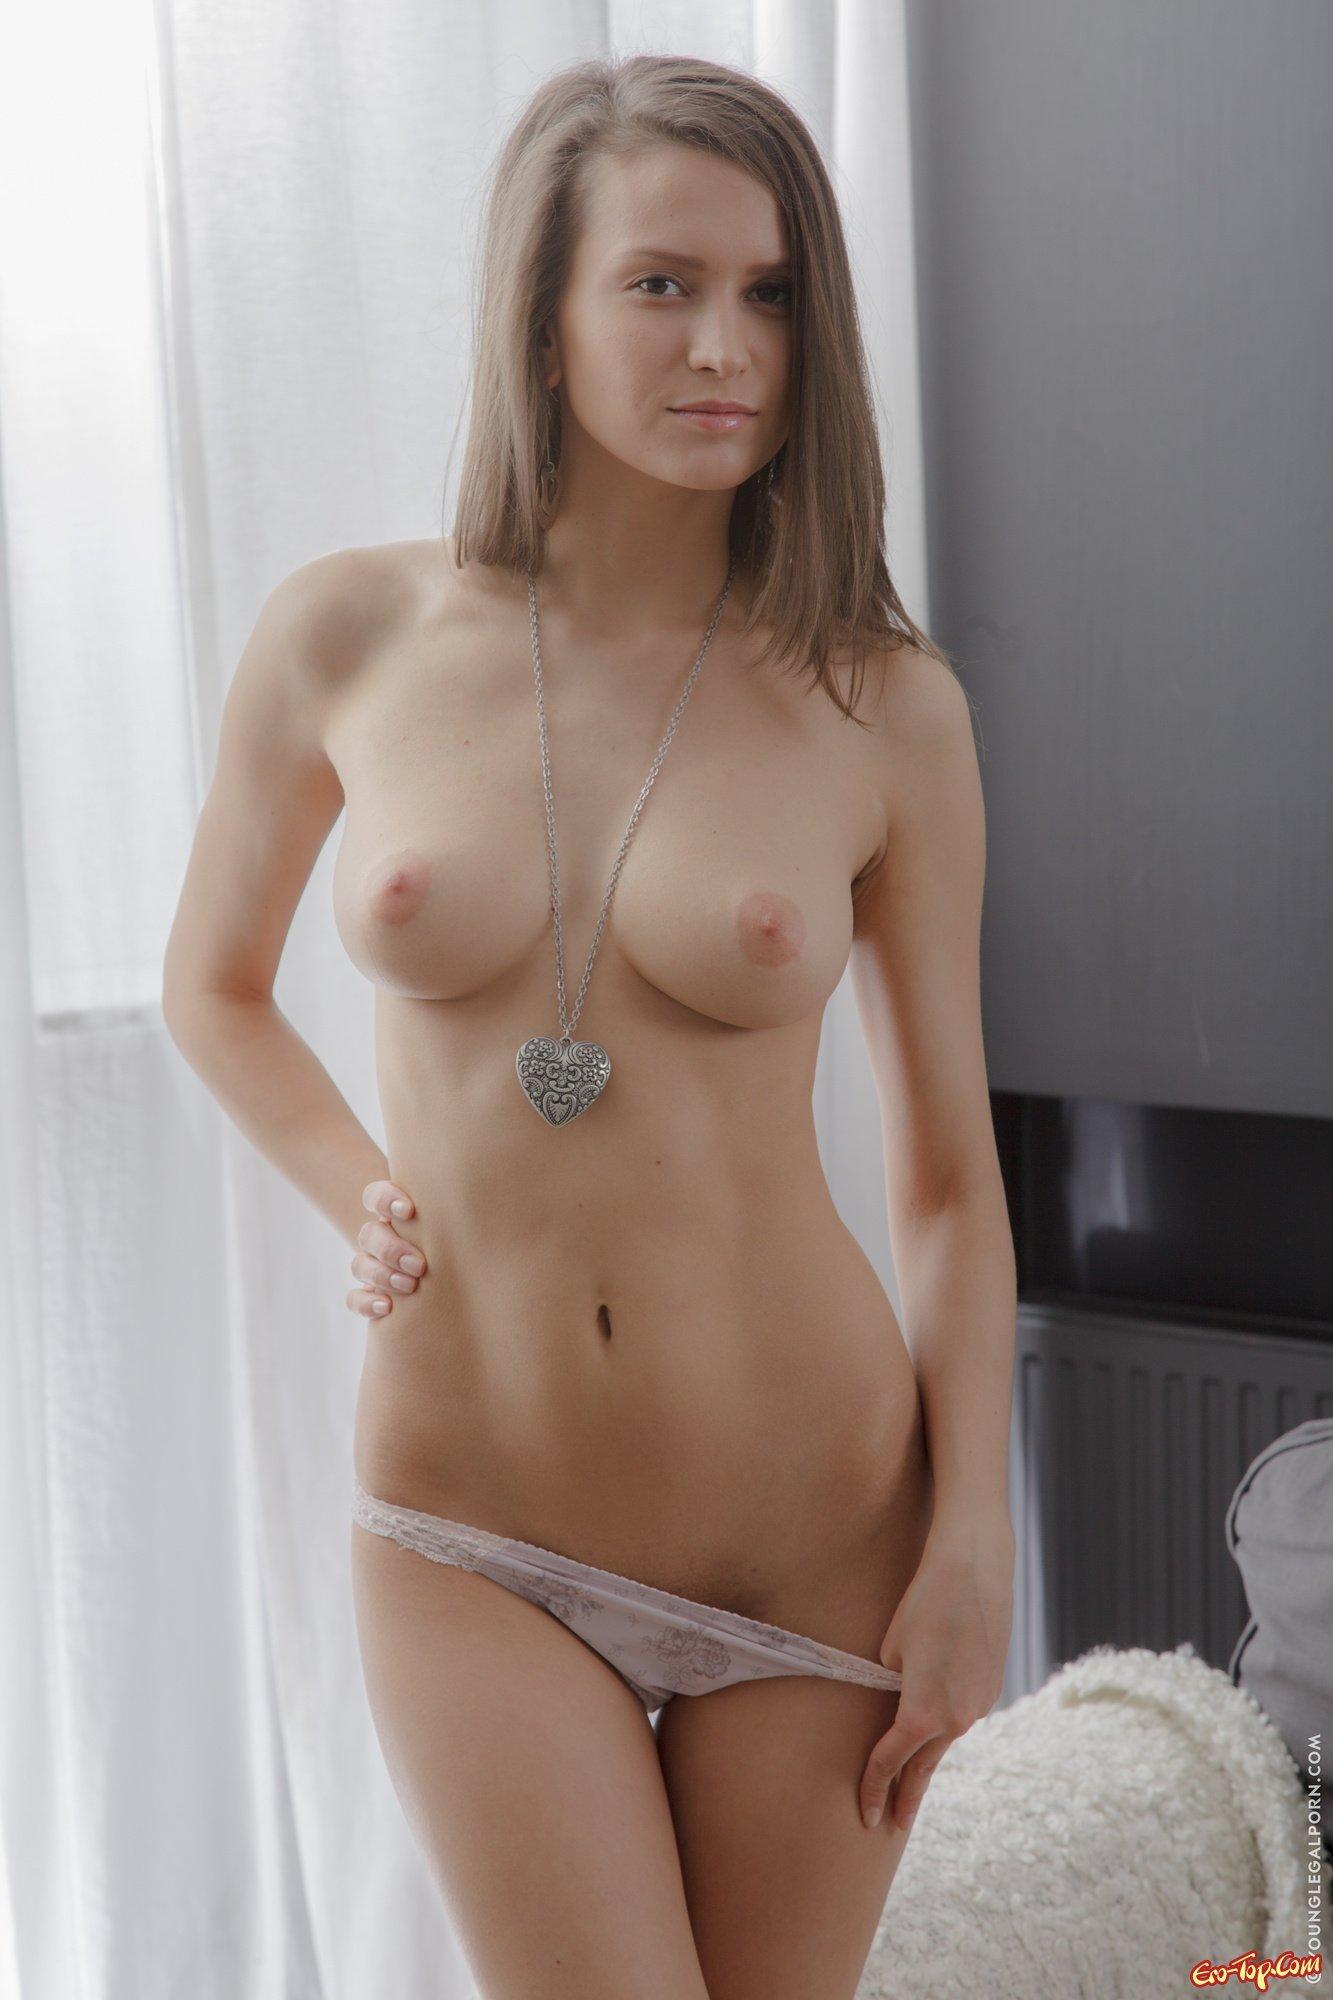 посетила порно с русскими стриптизершами фраза... супер, великолепная